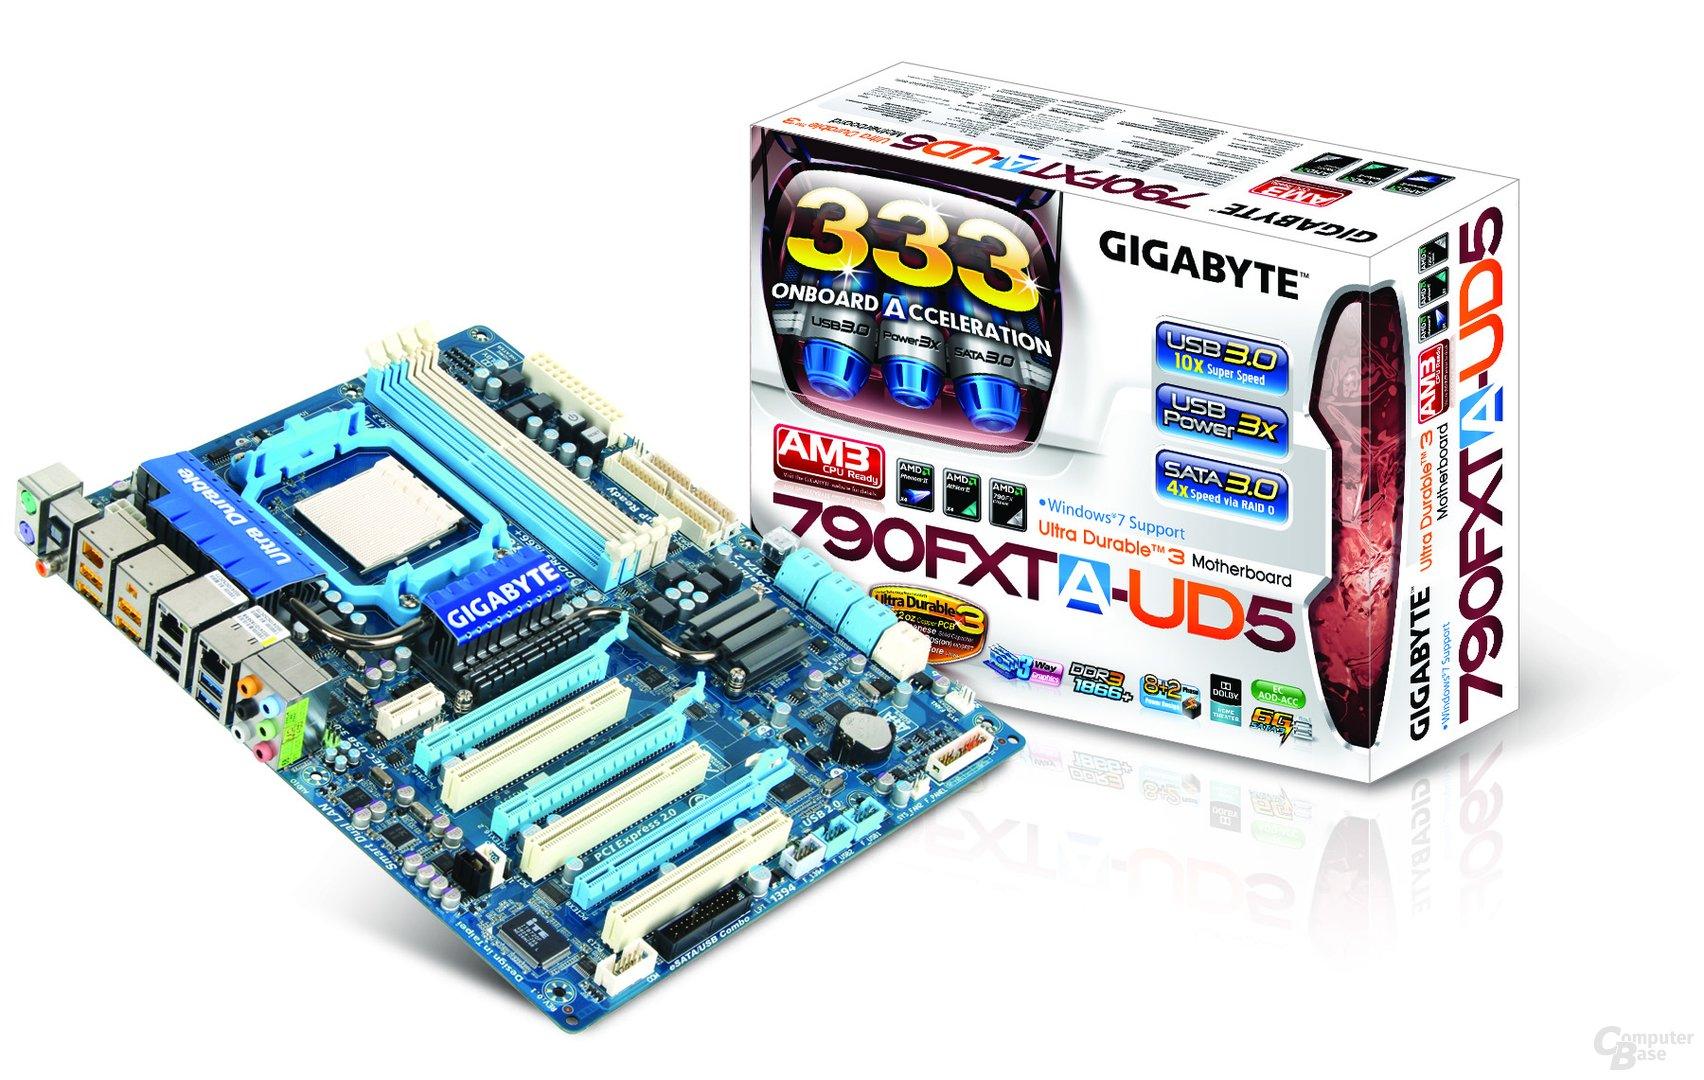 Gigabyte 790FXTA UD5